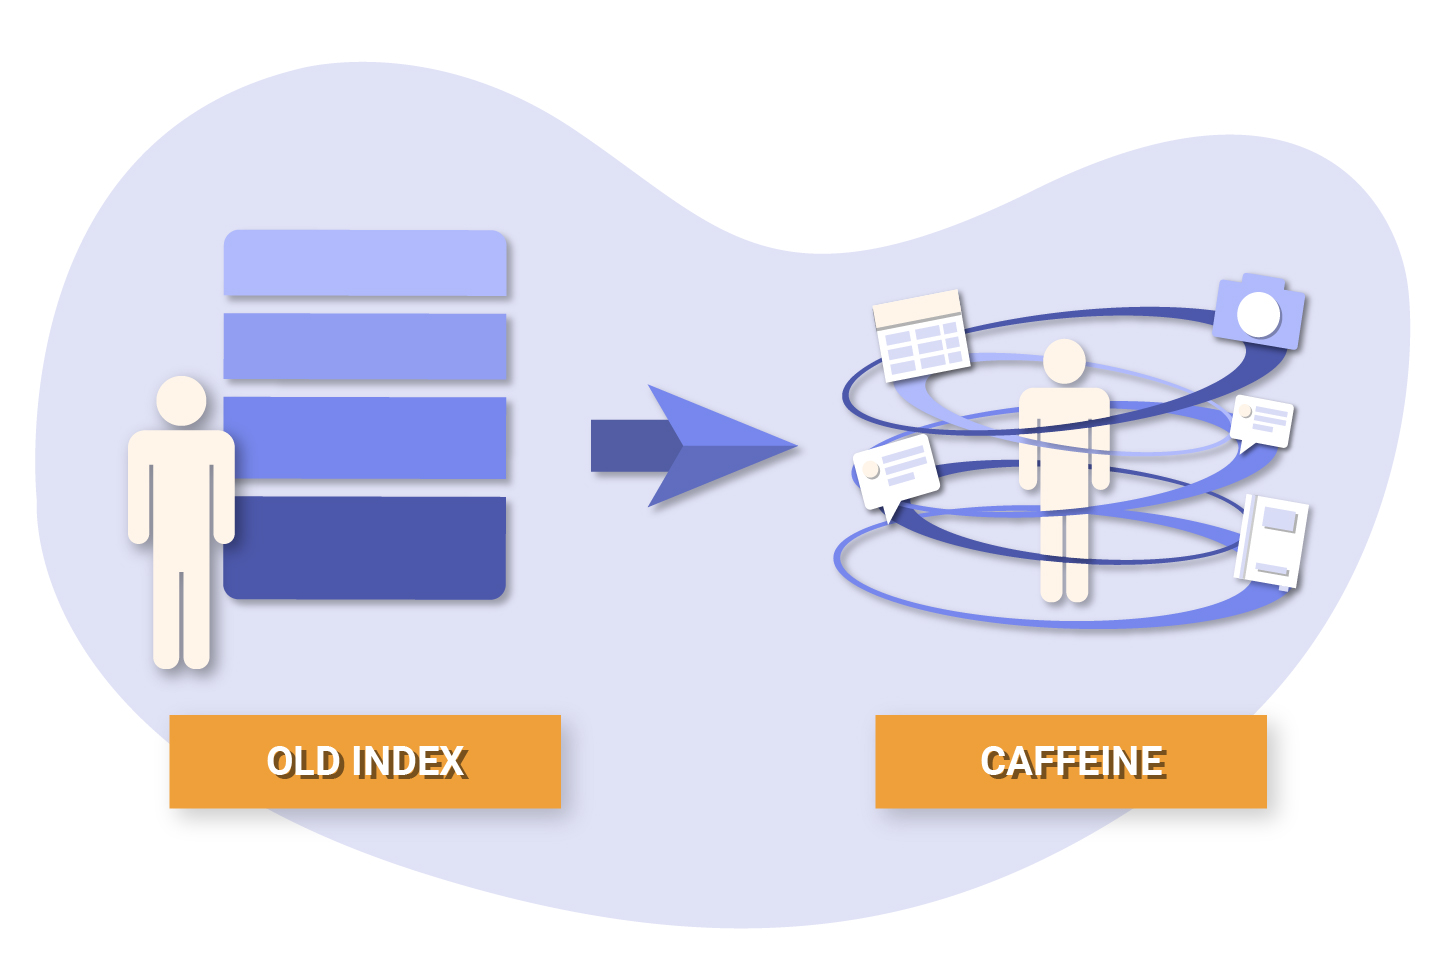 Caffeine - Google Indexing Infrastructure